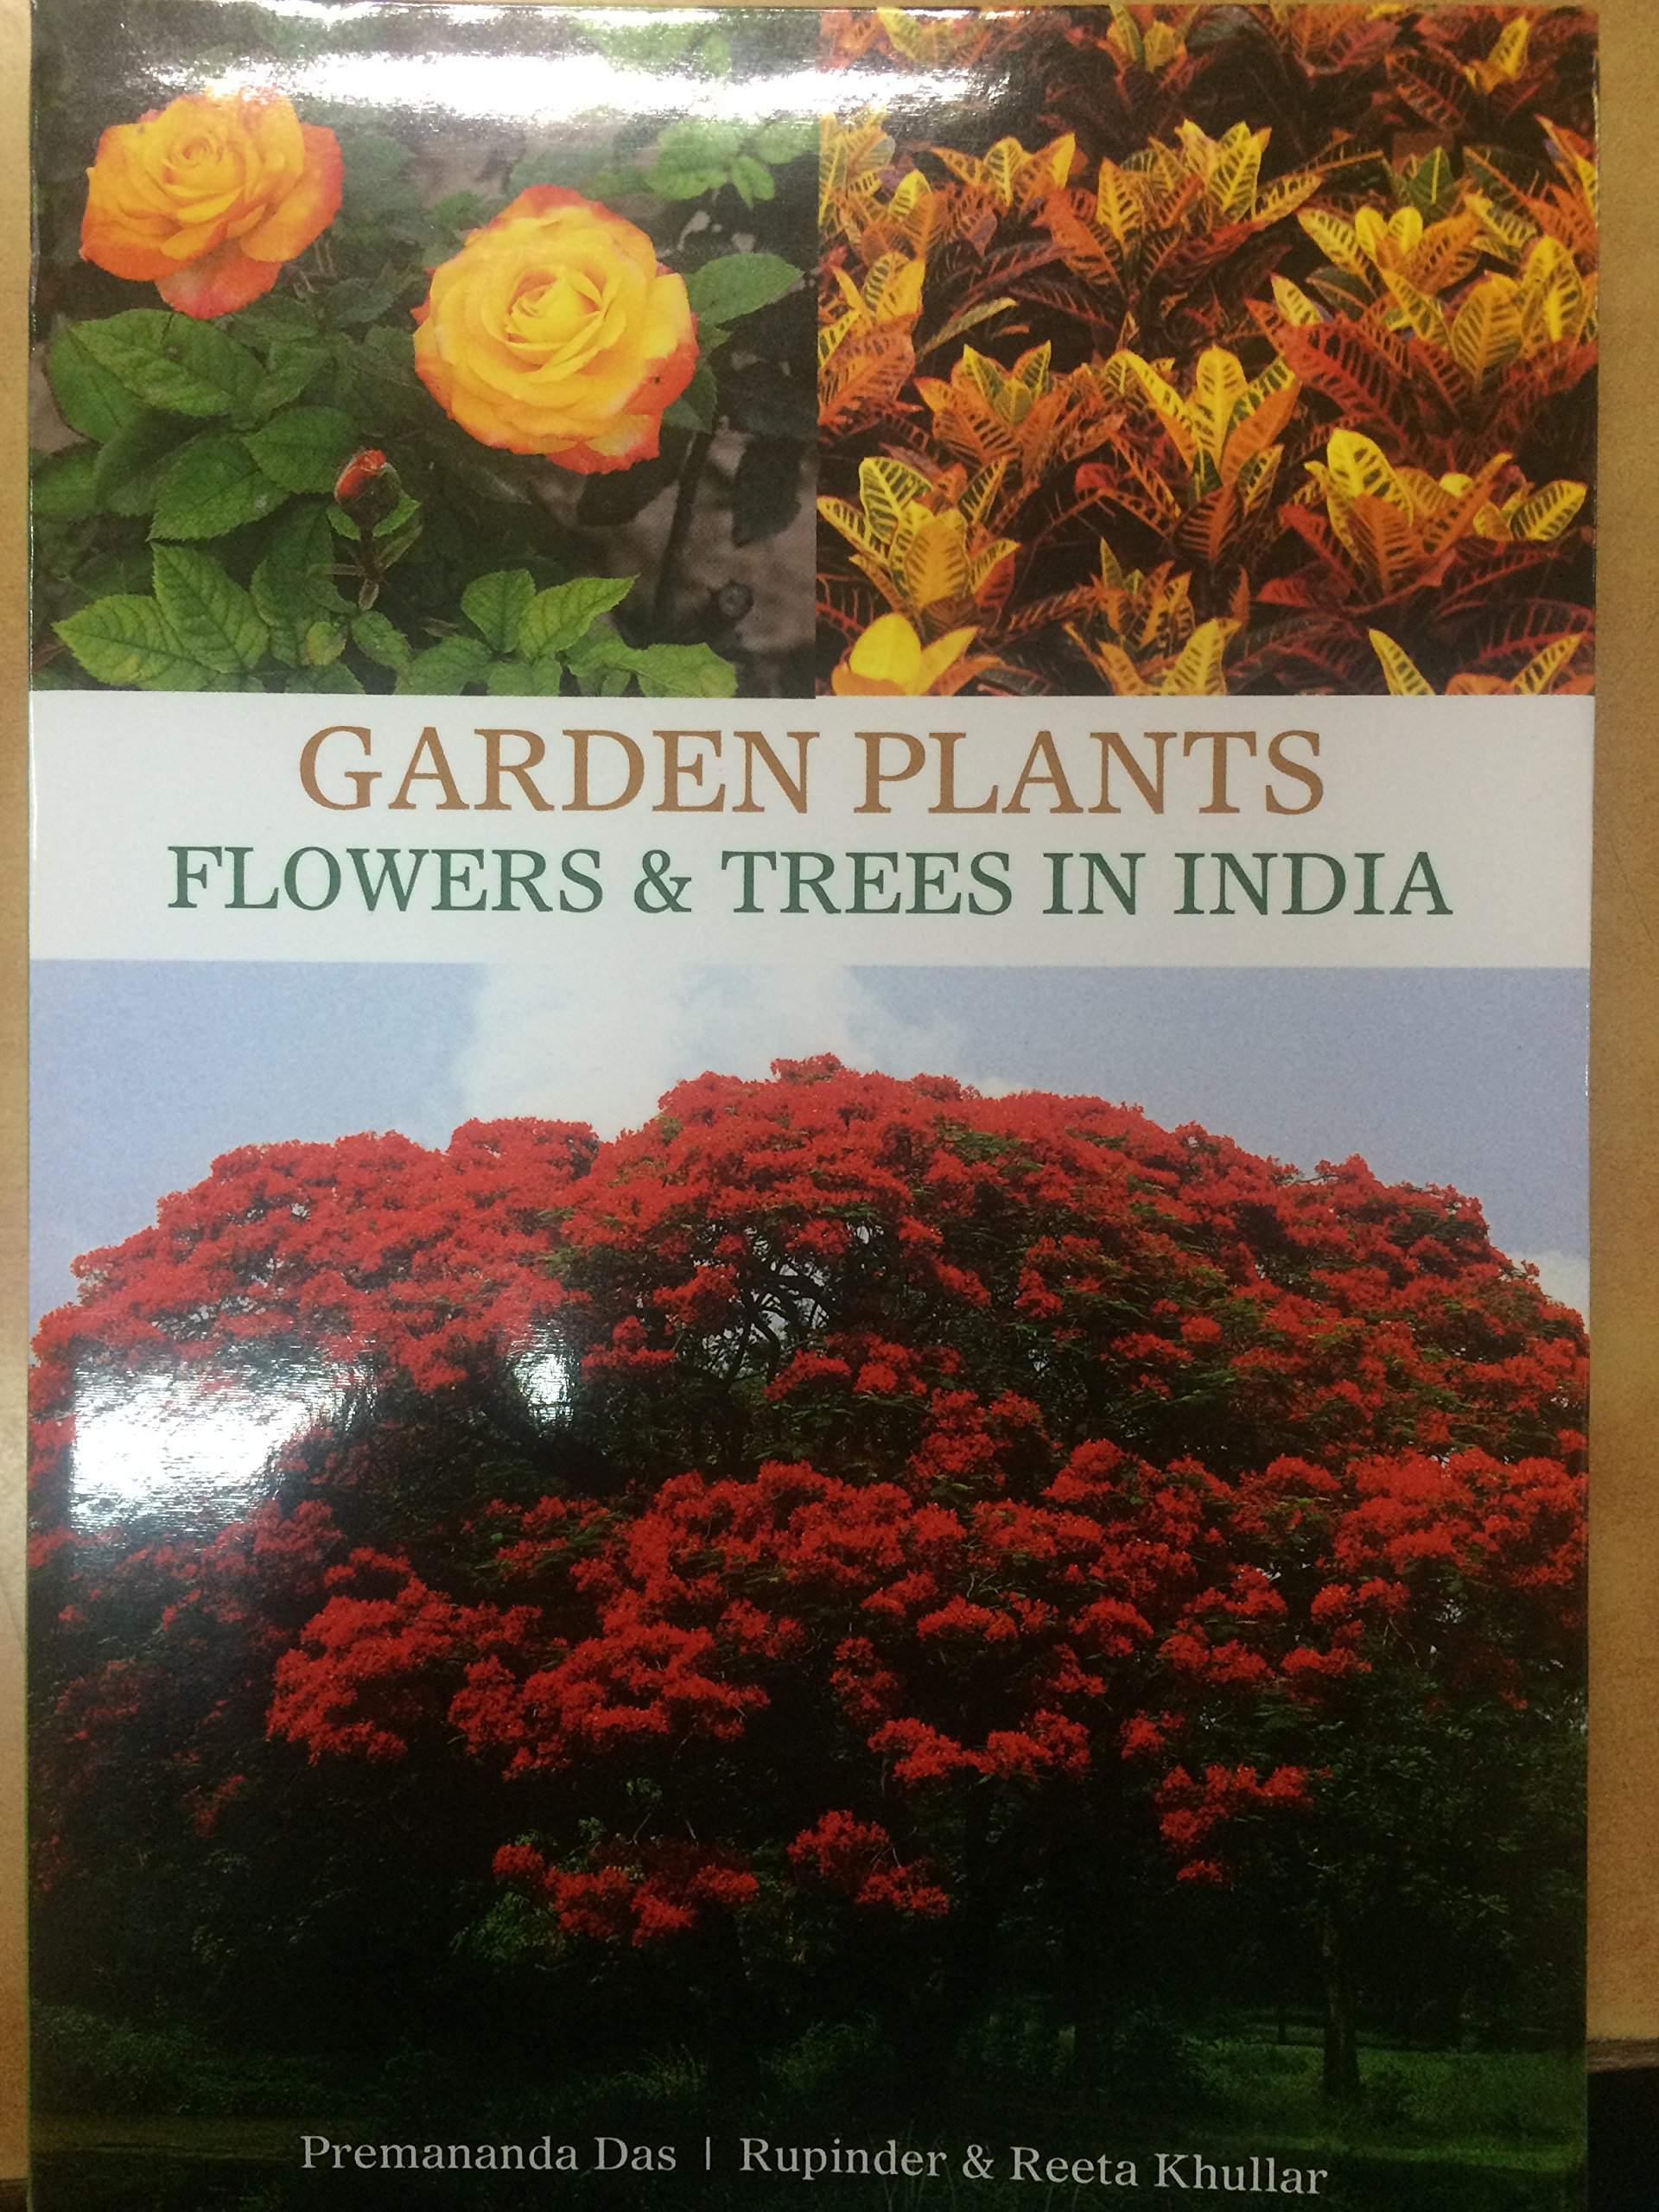 Amazon Buy Garden Plants Flowers Trees In India Book Online At